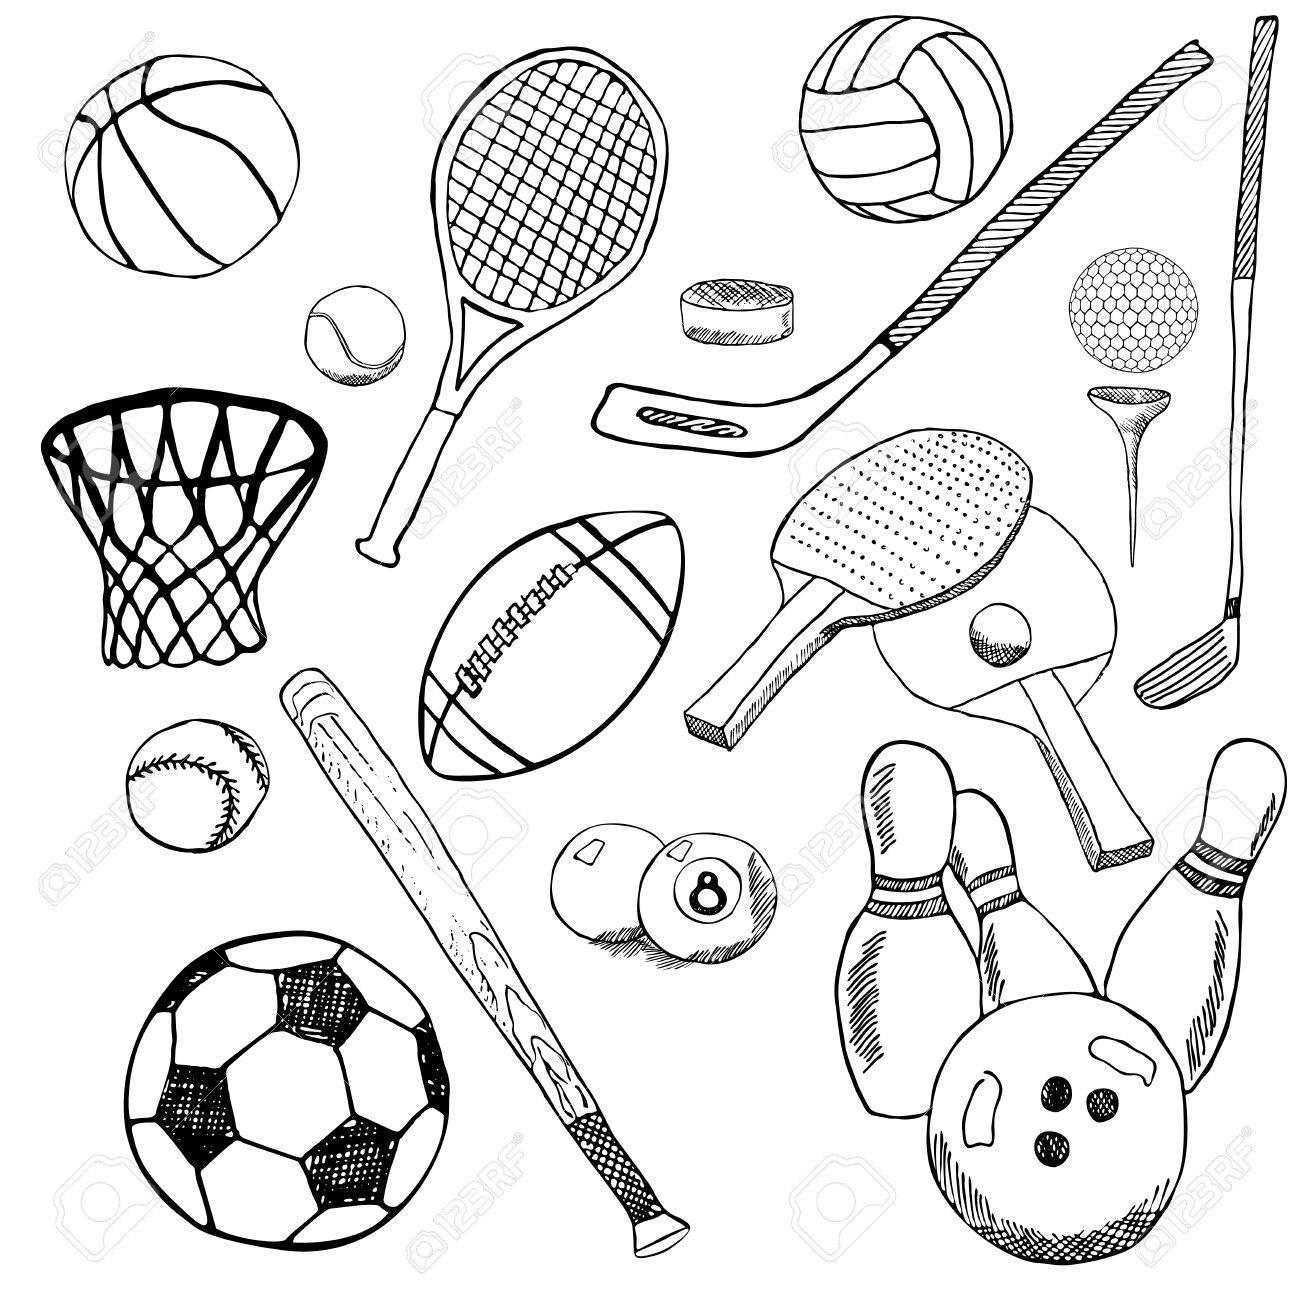 1300x1300 Sport Balls Hand Drawn Sketch Set With Baseball, Bowling, Tennis